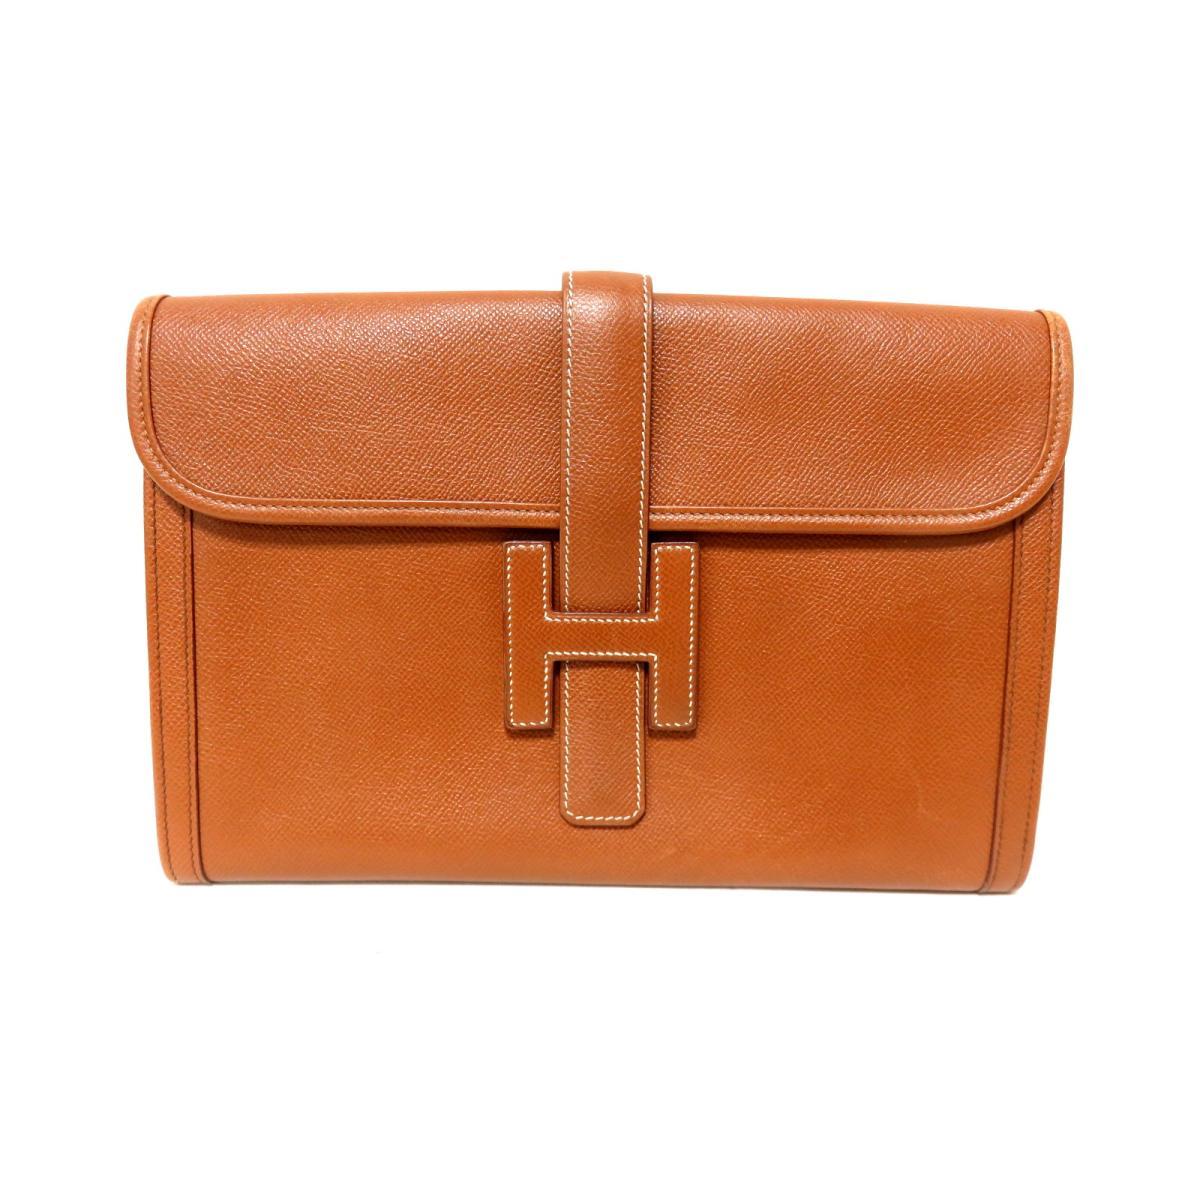 ac5827a3a427 BRANDOFF  Authentic HERMES Jige second clutch Bag Couchever leather ...